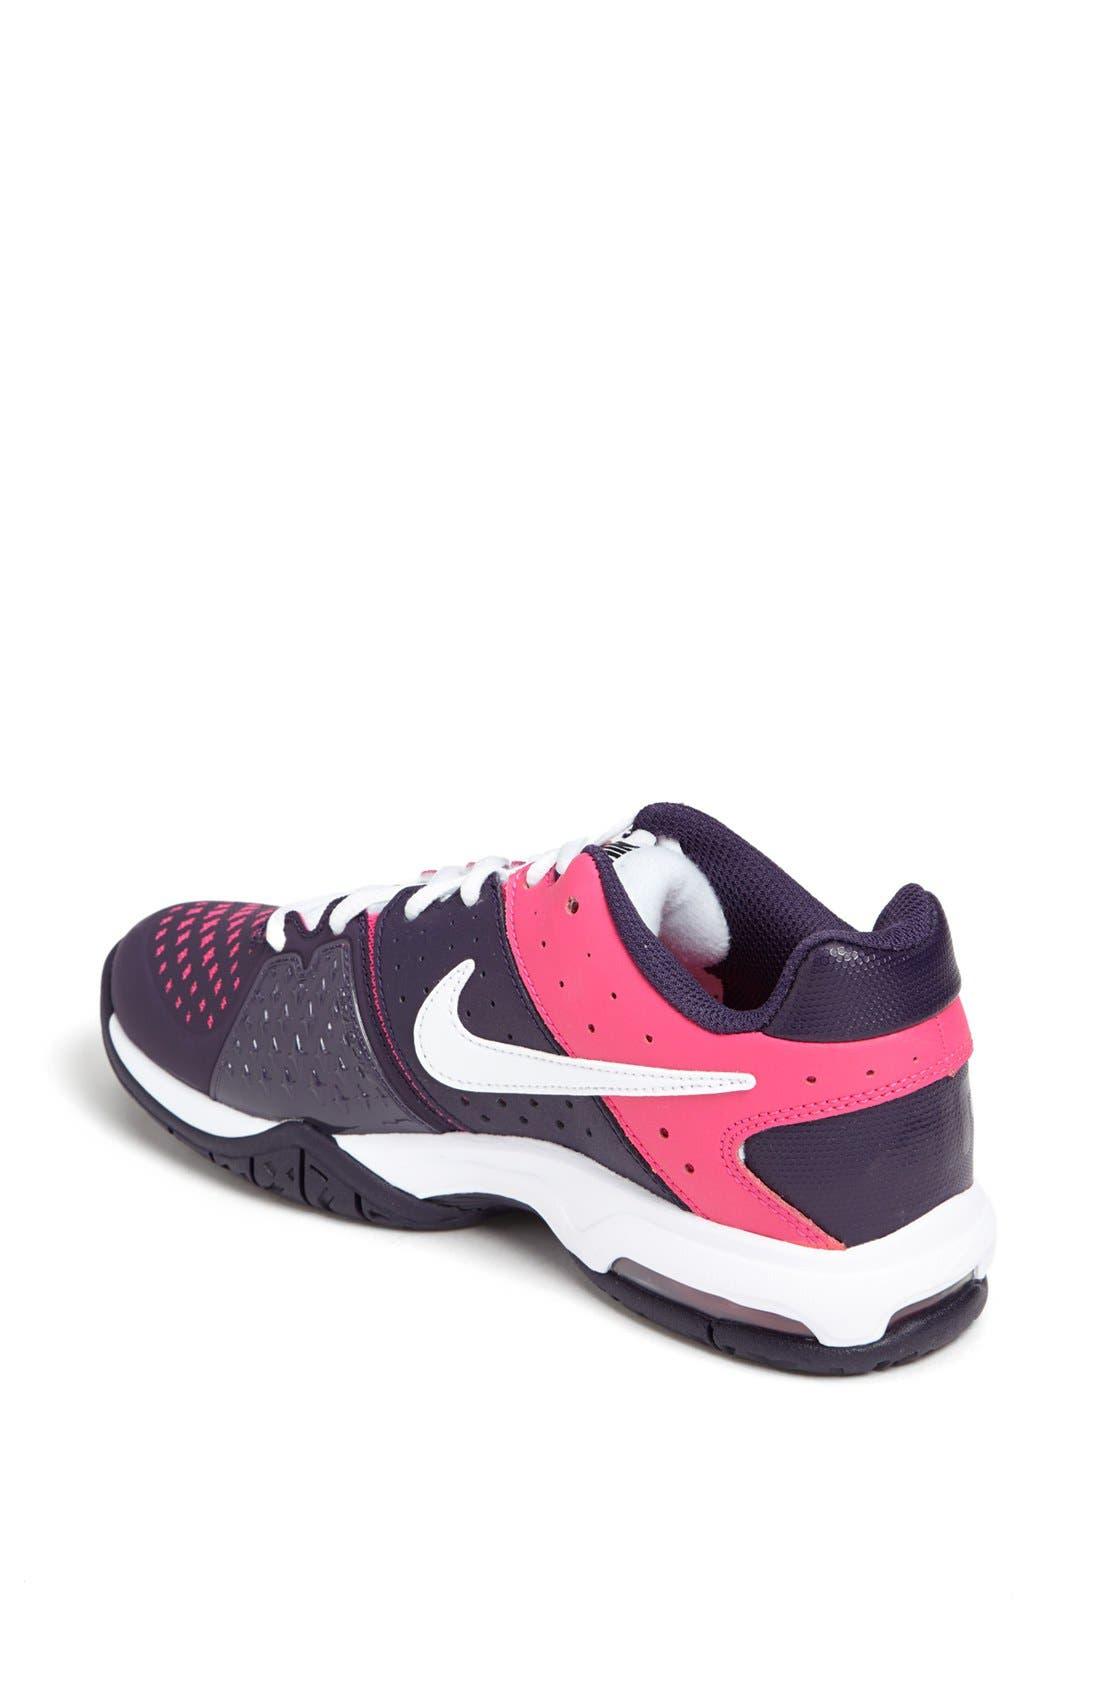 Alternate Image 2  - Nike 'Air Cage Advantage' Tennis Shoe (Women)